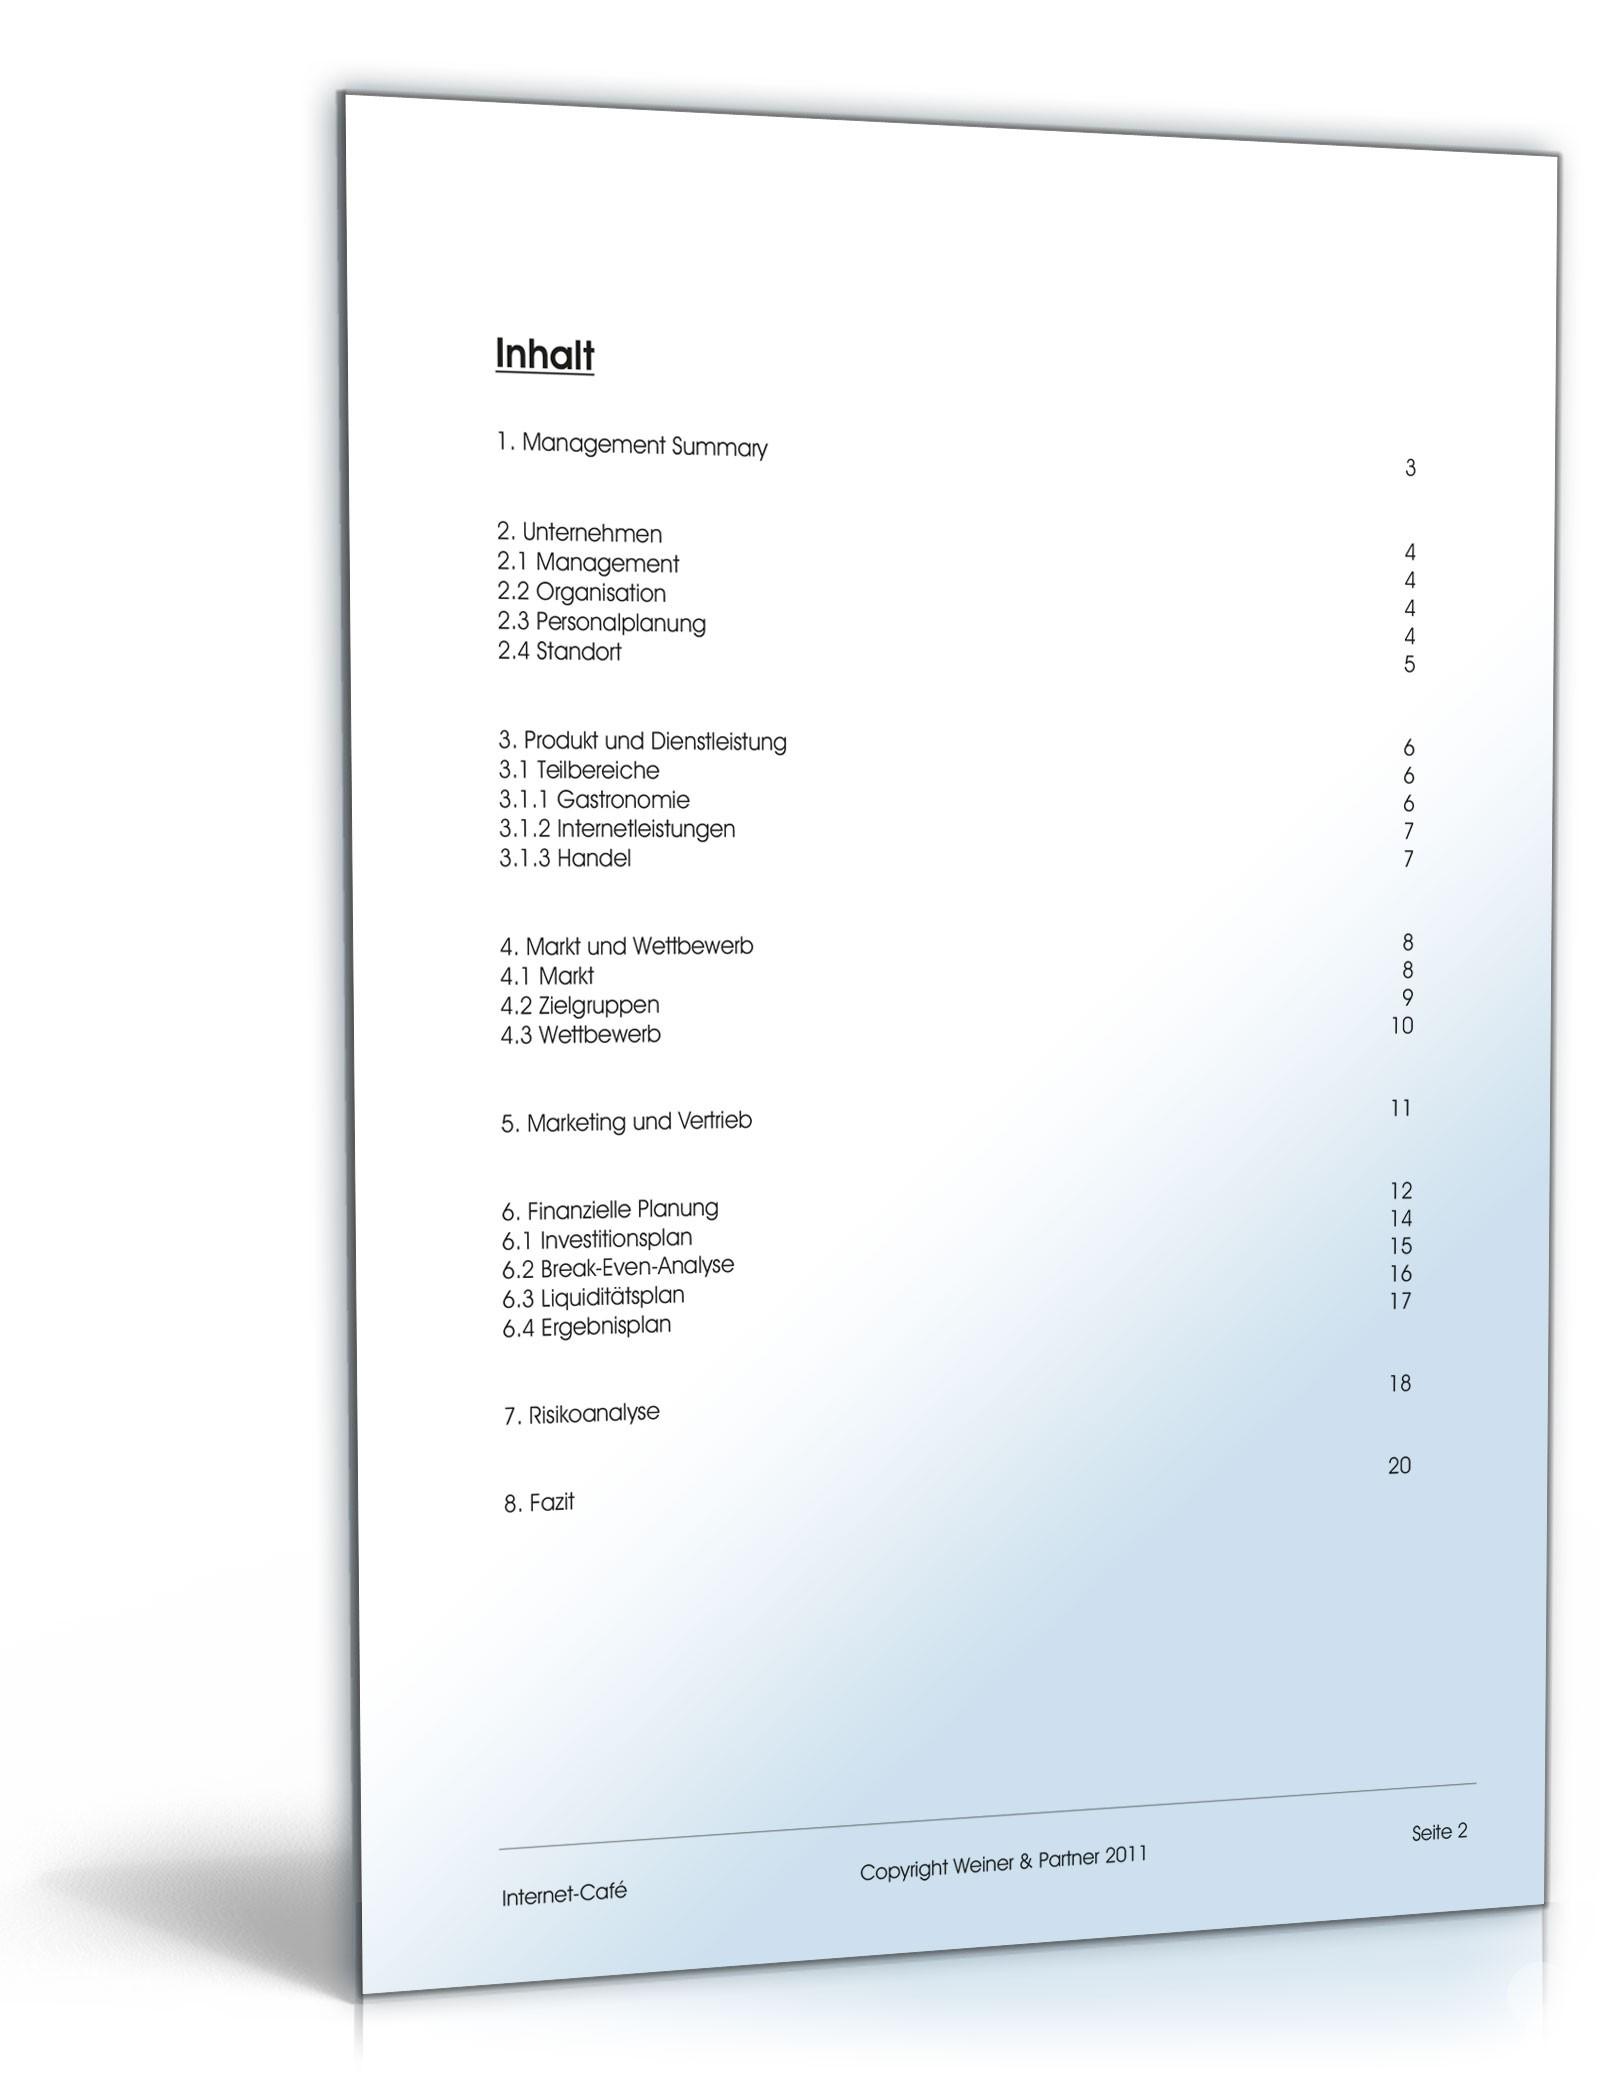 Tolle Grundlegendes Lebenslaufformat Pdf Bilder - Entry Level Resume ...